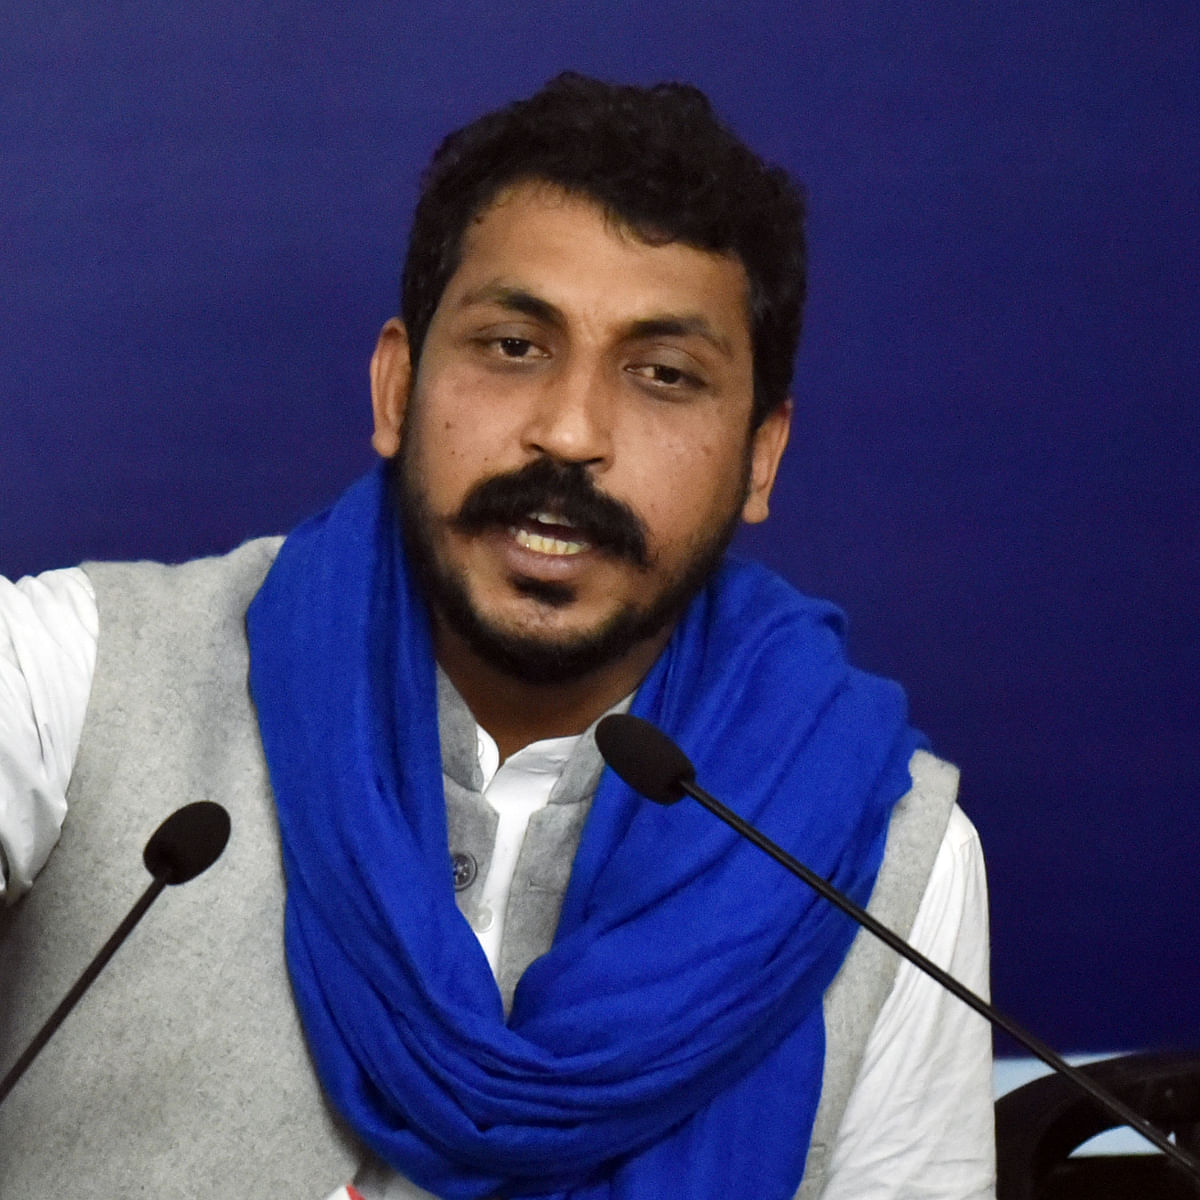 'Dictatorship is at its peak': Chandrashekhar Azad on forcibly being sent to Delhi